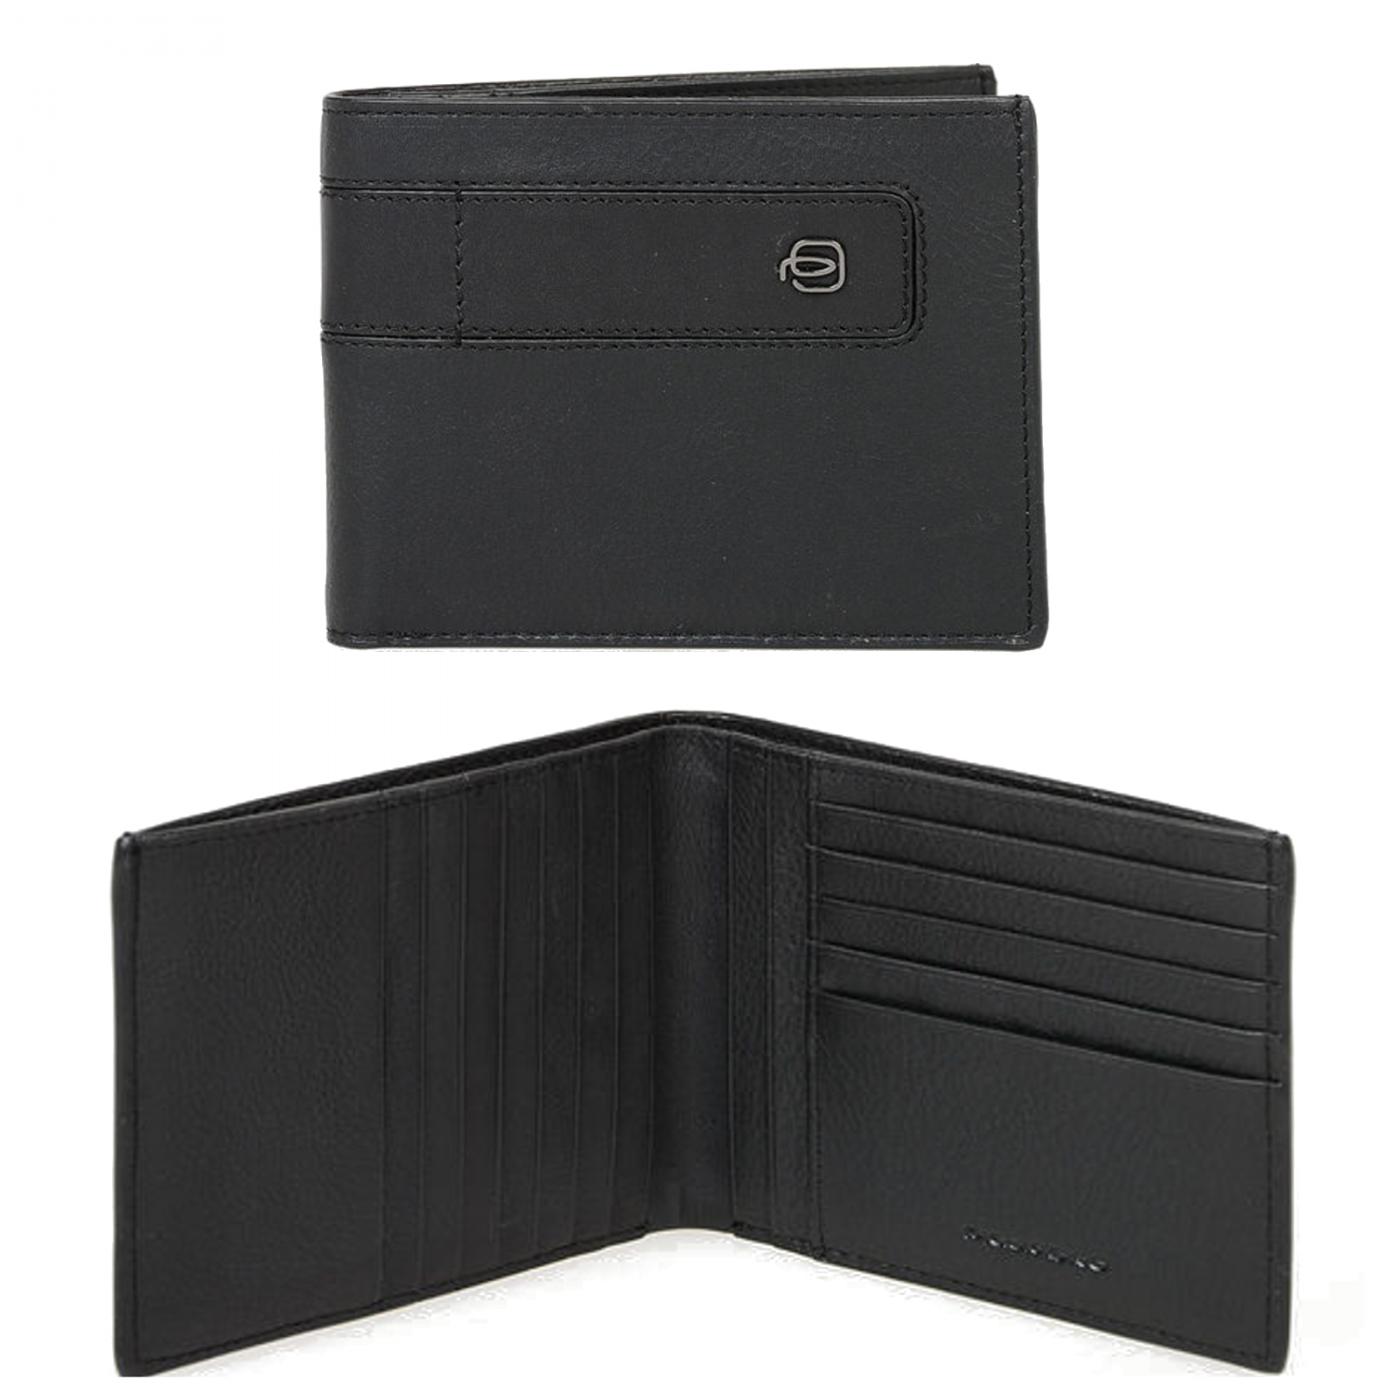 PIQUADRO Bae portafogli uomo 12 cc, RFID, pelle nero